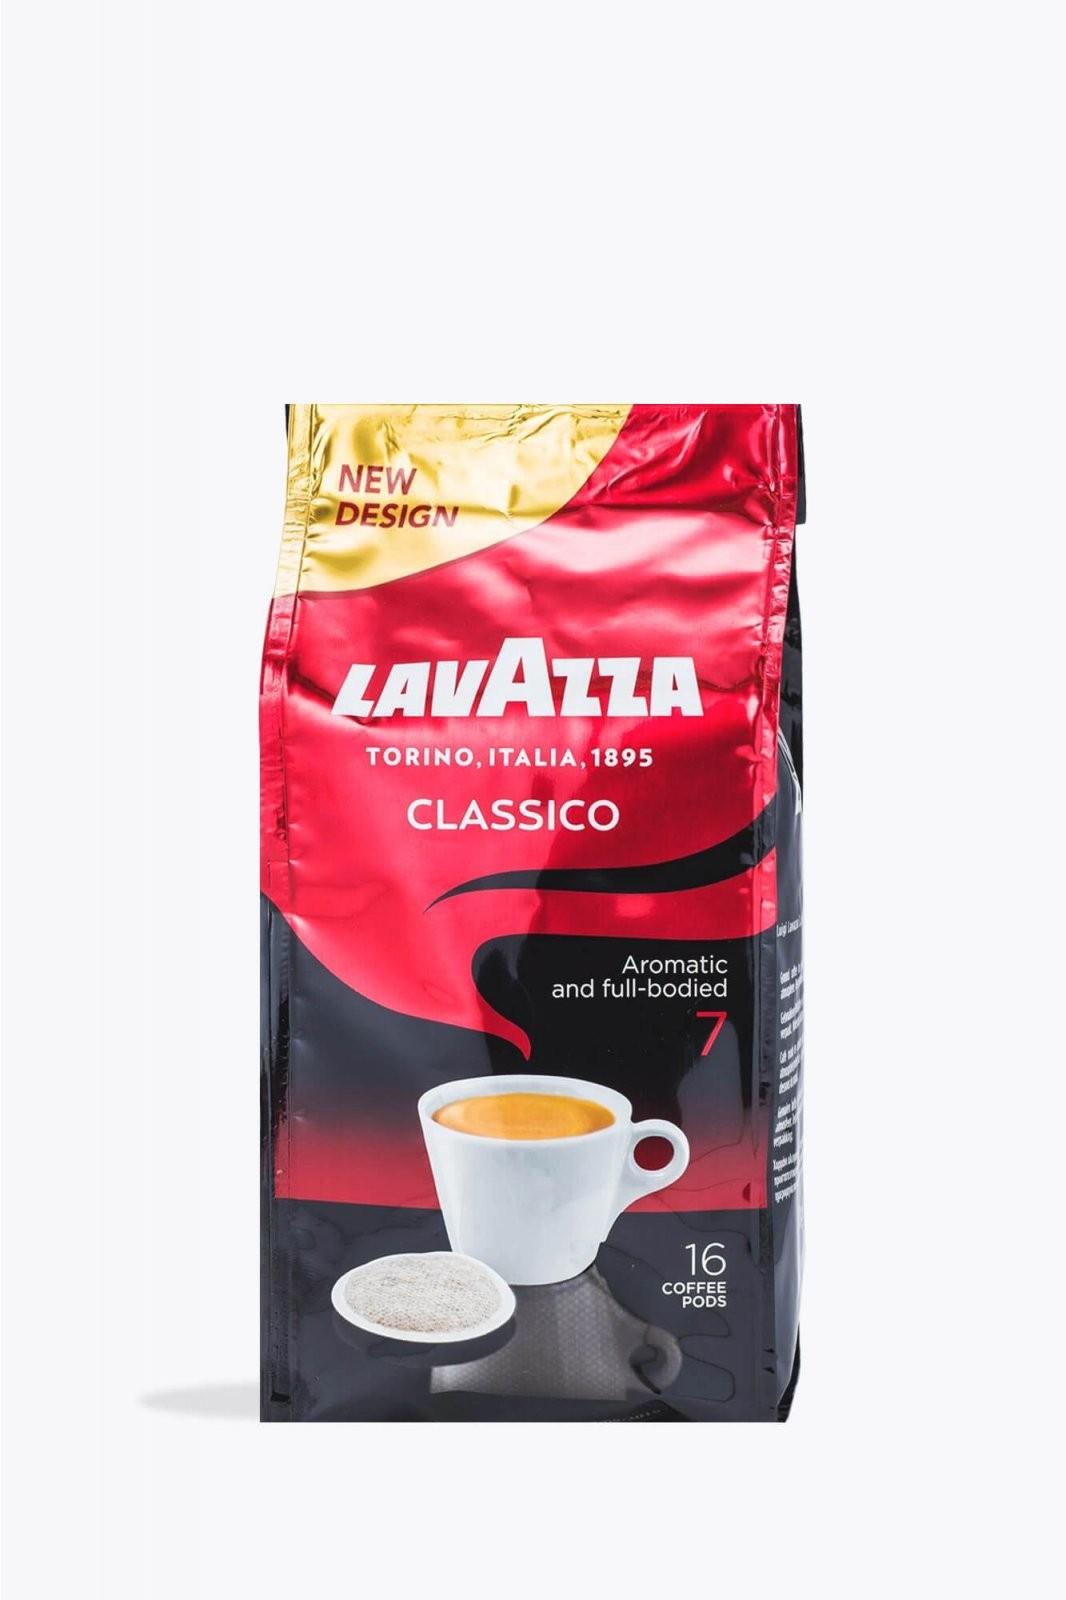 Lavazza Caffé Crema Classico 16 Pads Senseokompatibel Online Kaufen von Lavazza Crema Classico Angebot Photo